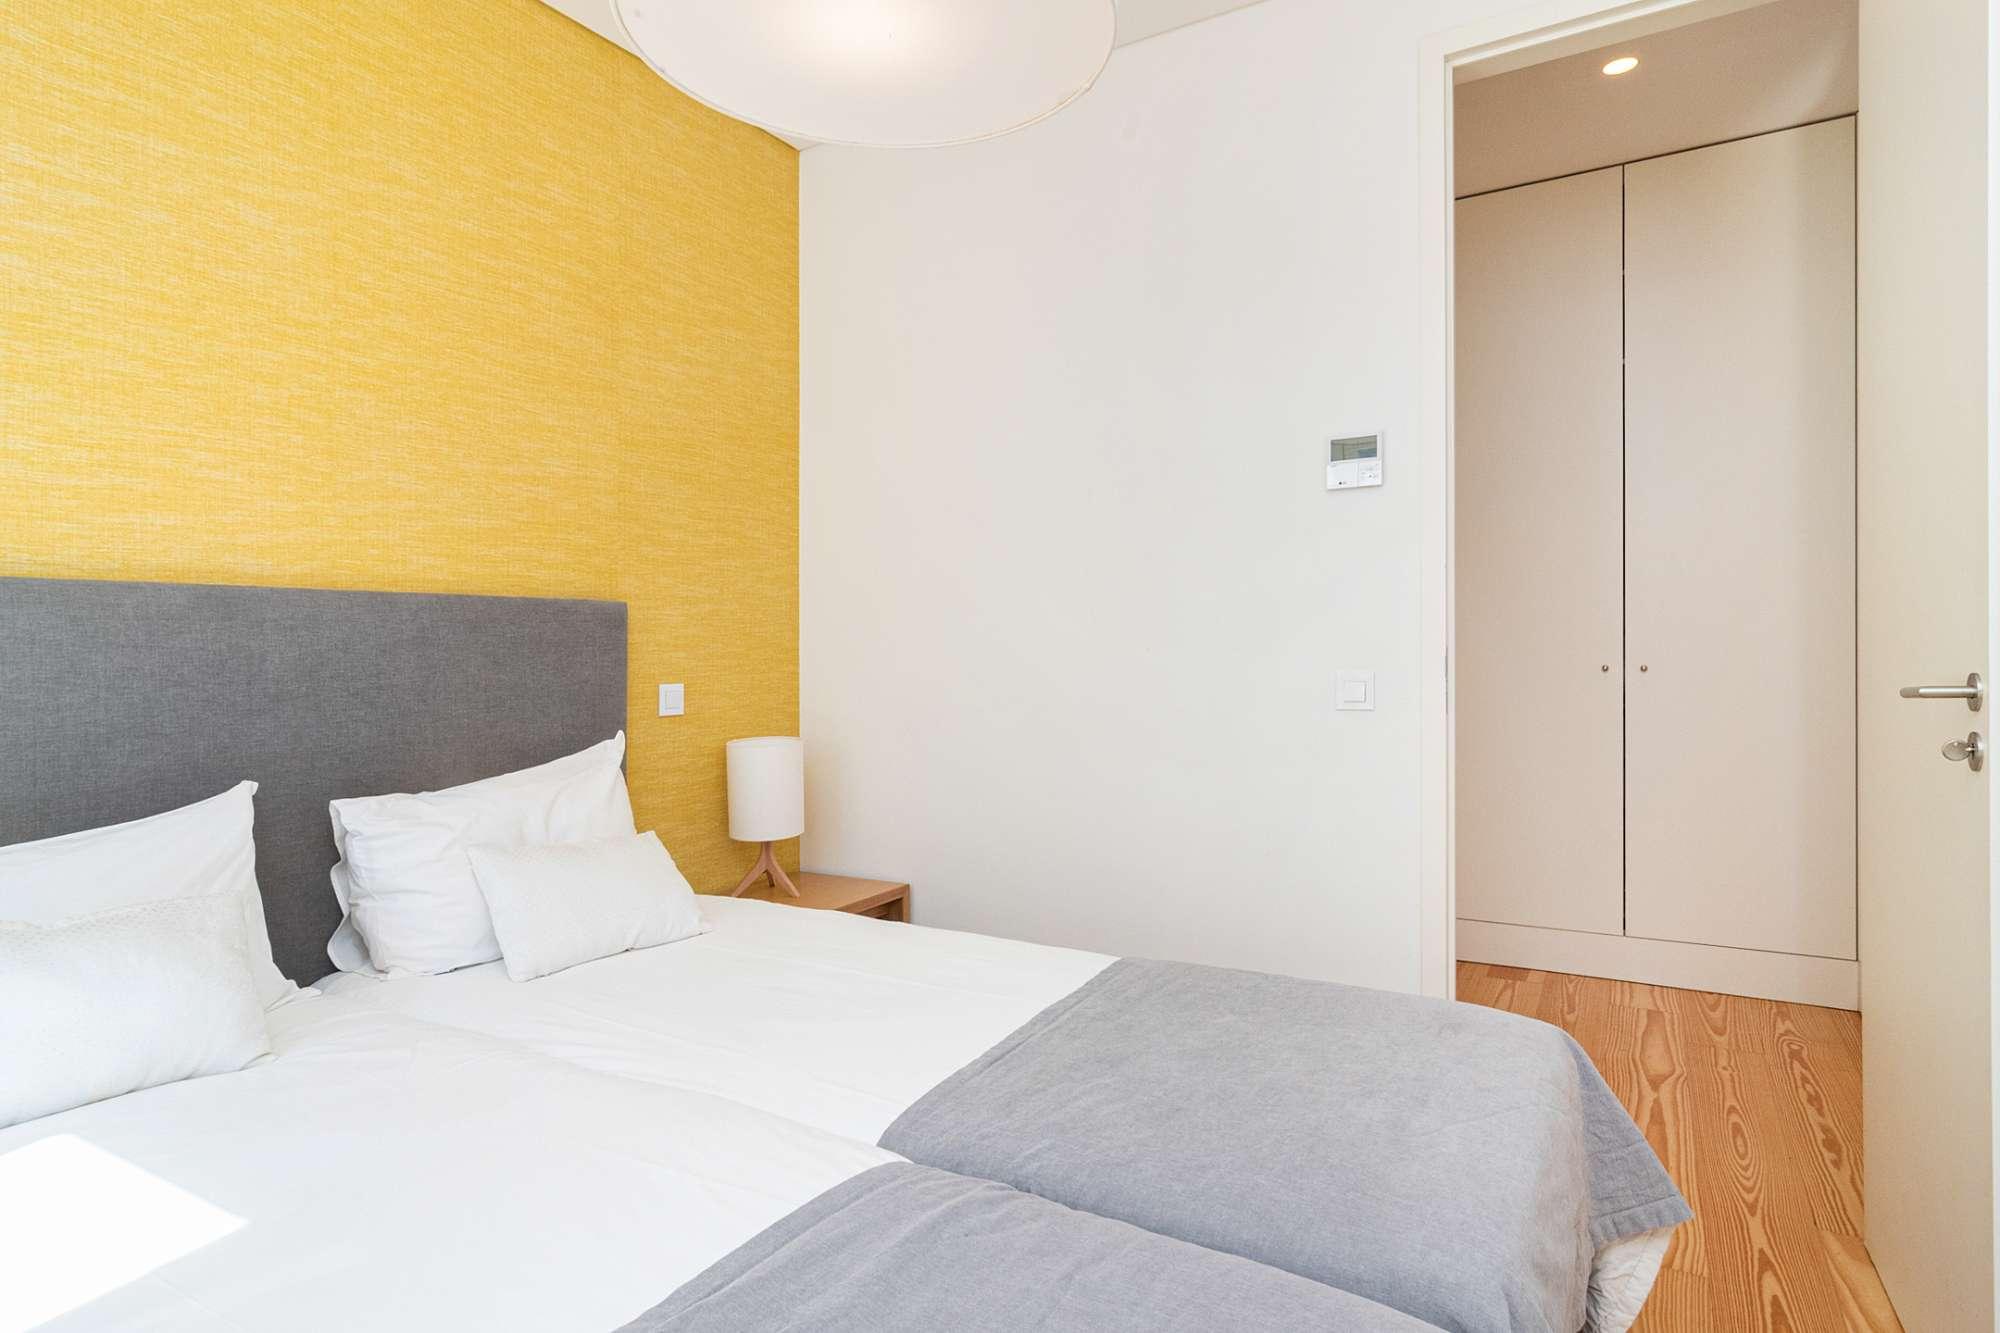 PF24657, Apartamento T1, Lisboa